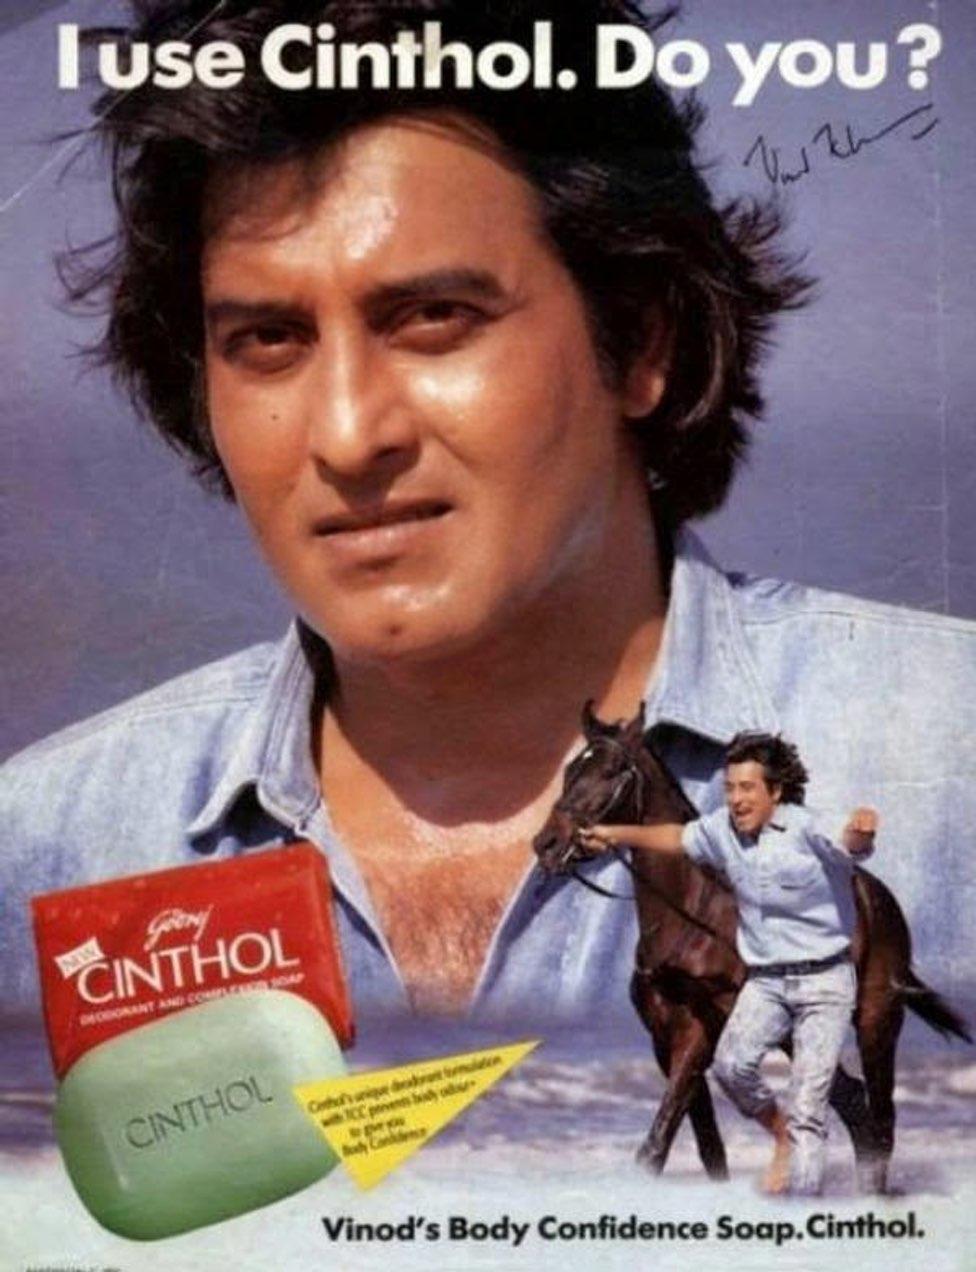 When Vinod Khanna rode a horse for Cinthol soap